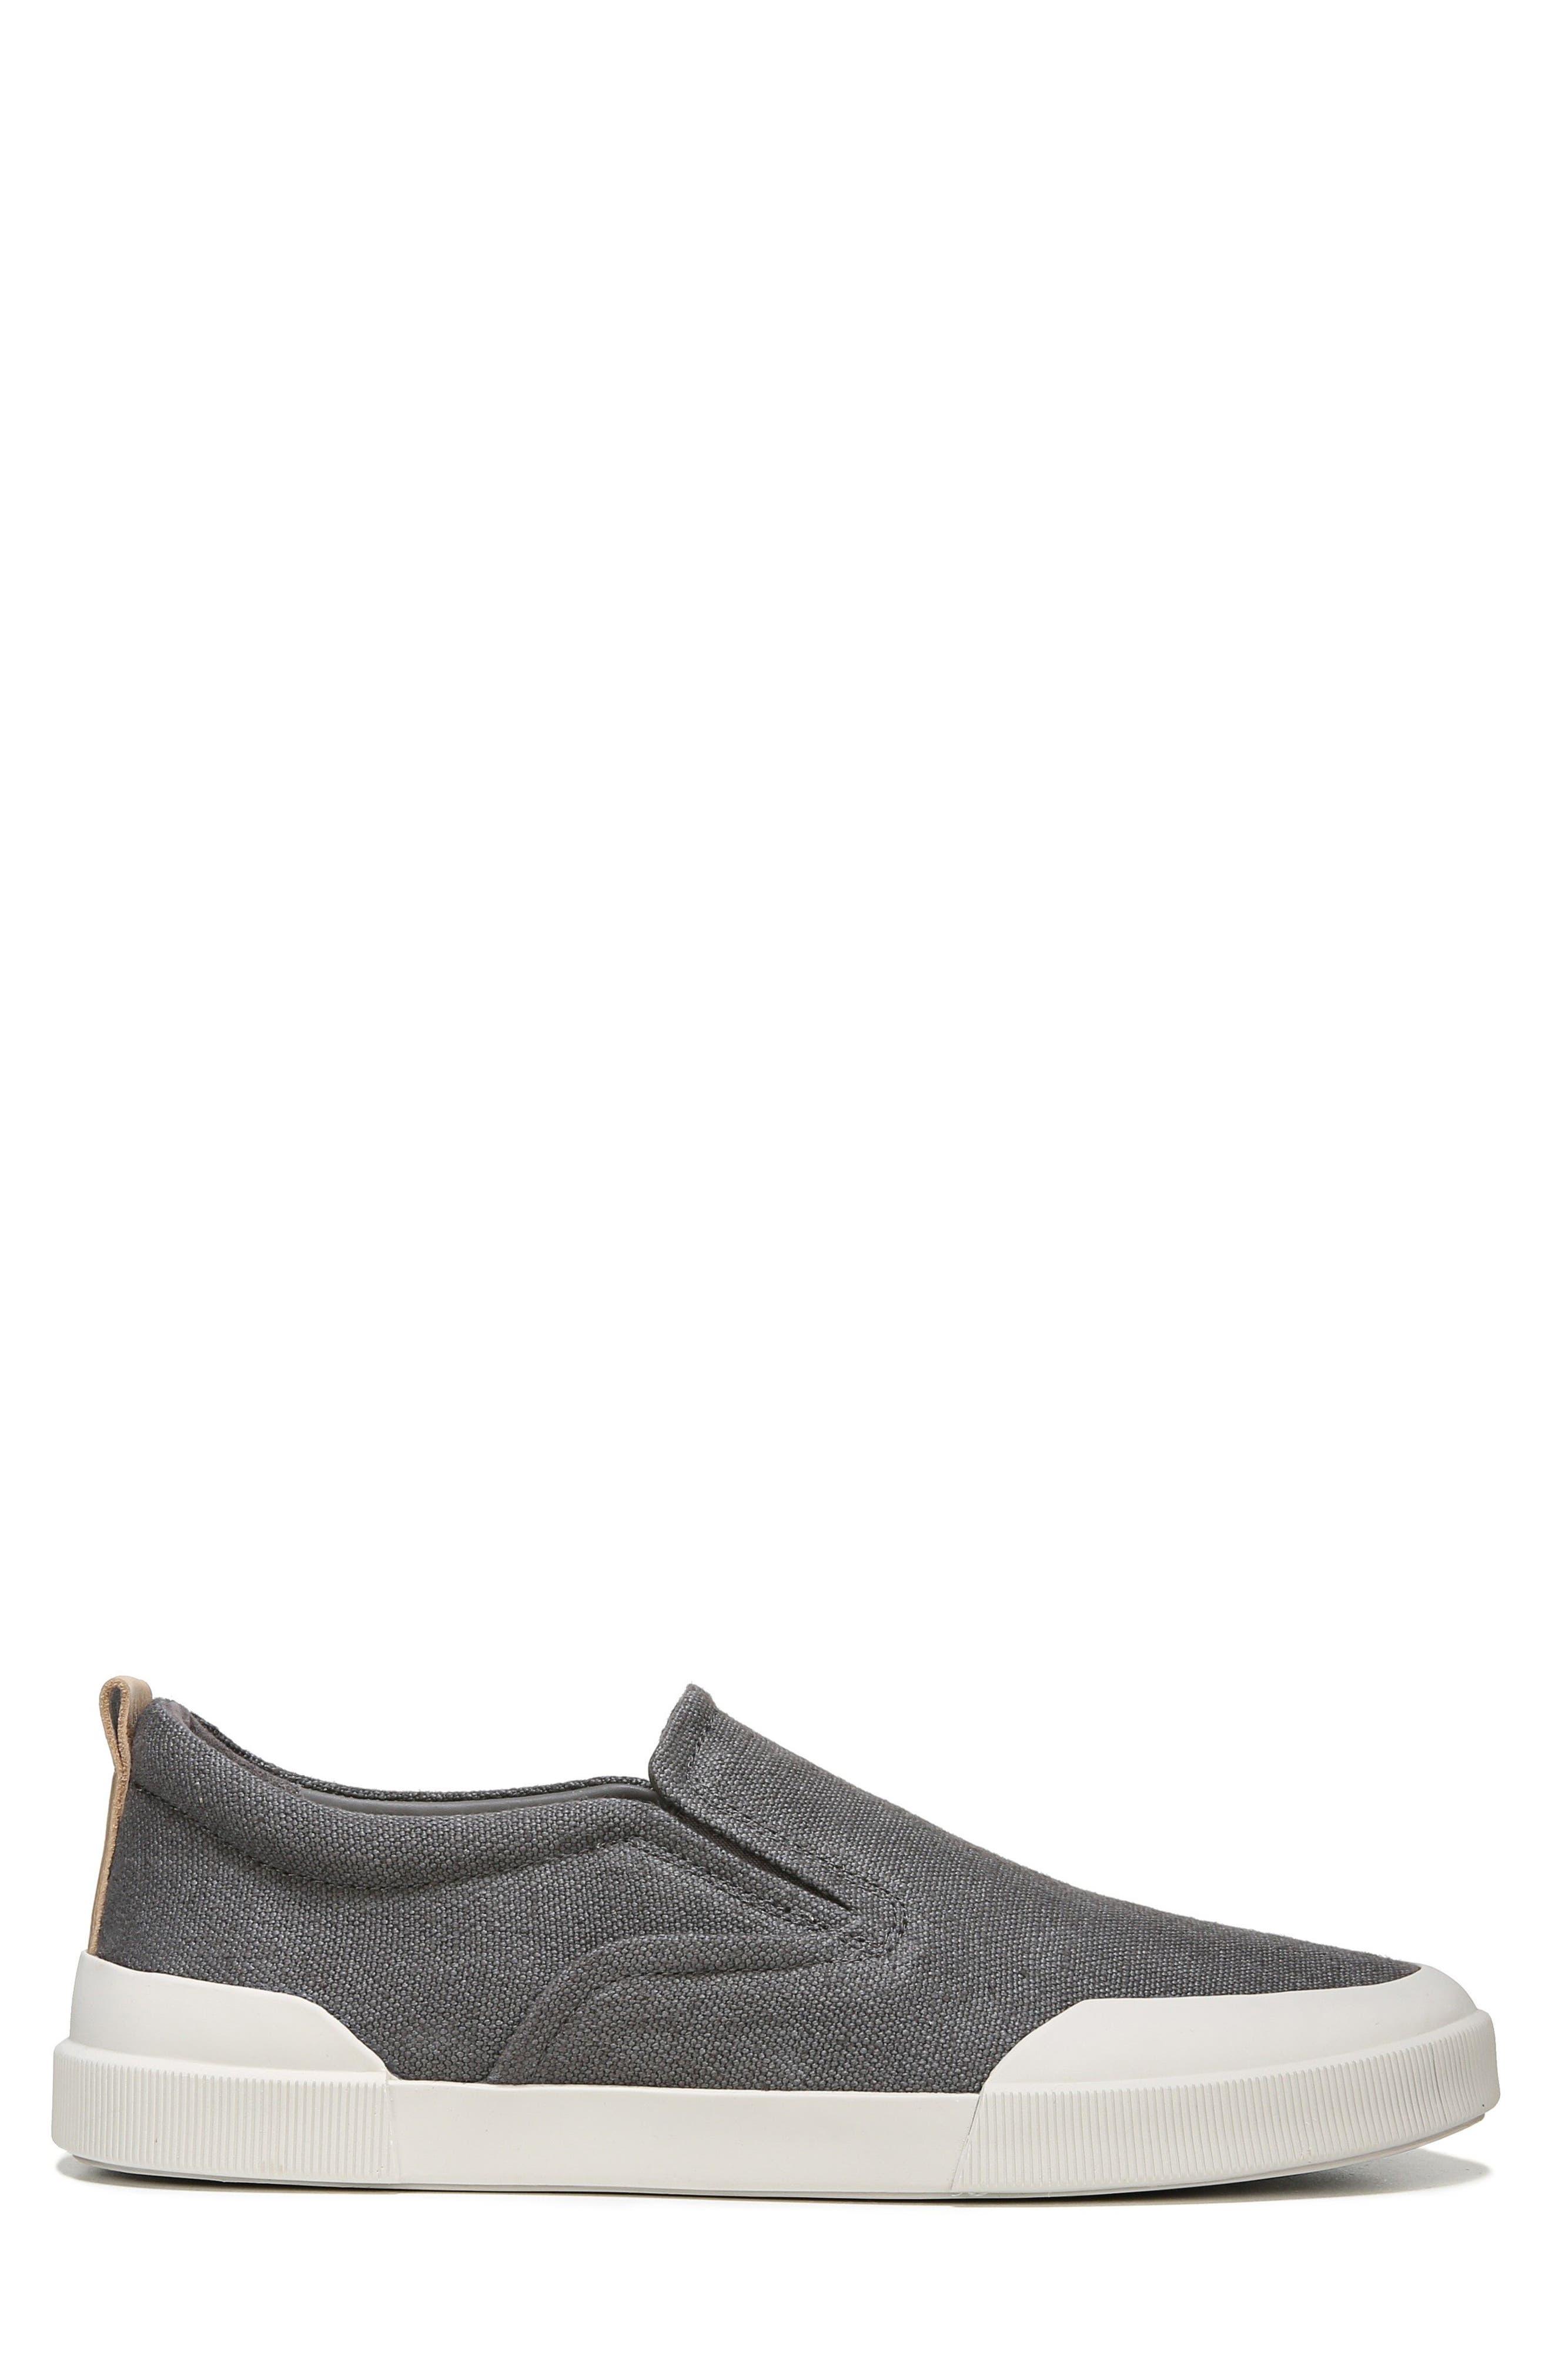 Vernon Slip-On Sneaker,                             Alternate thumbnail 3, color,                             Graphite/ Cuoio